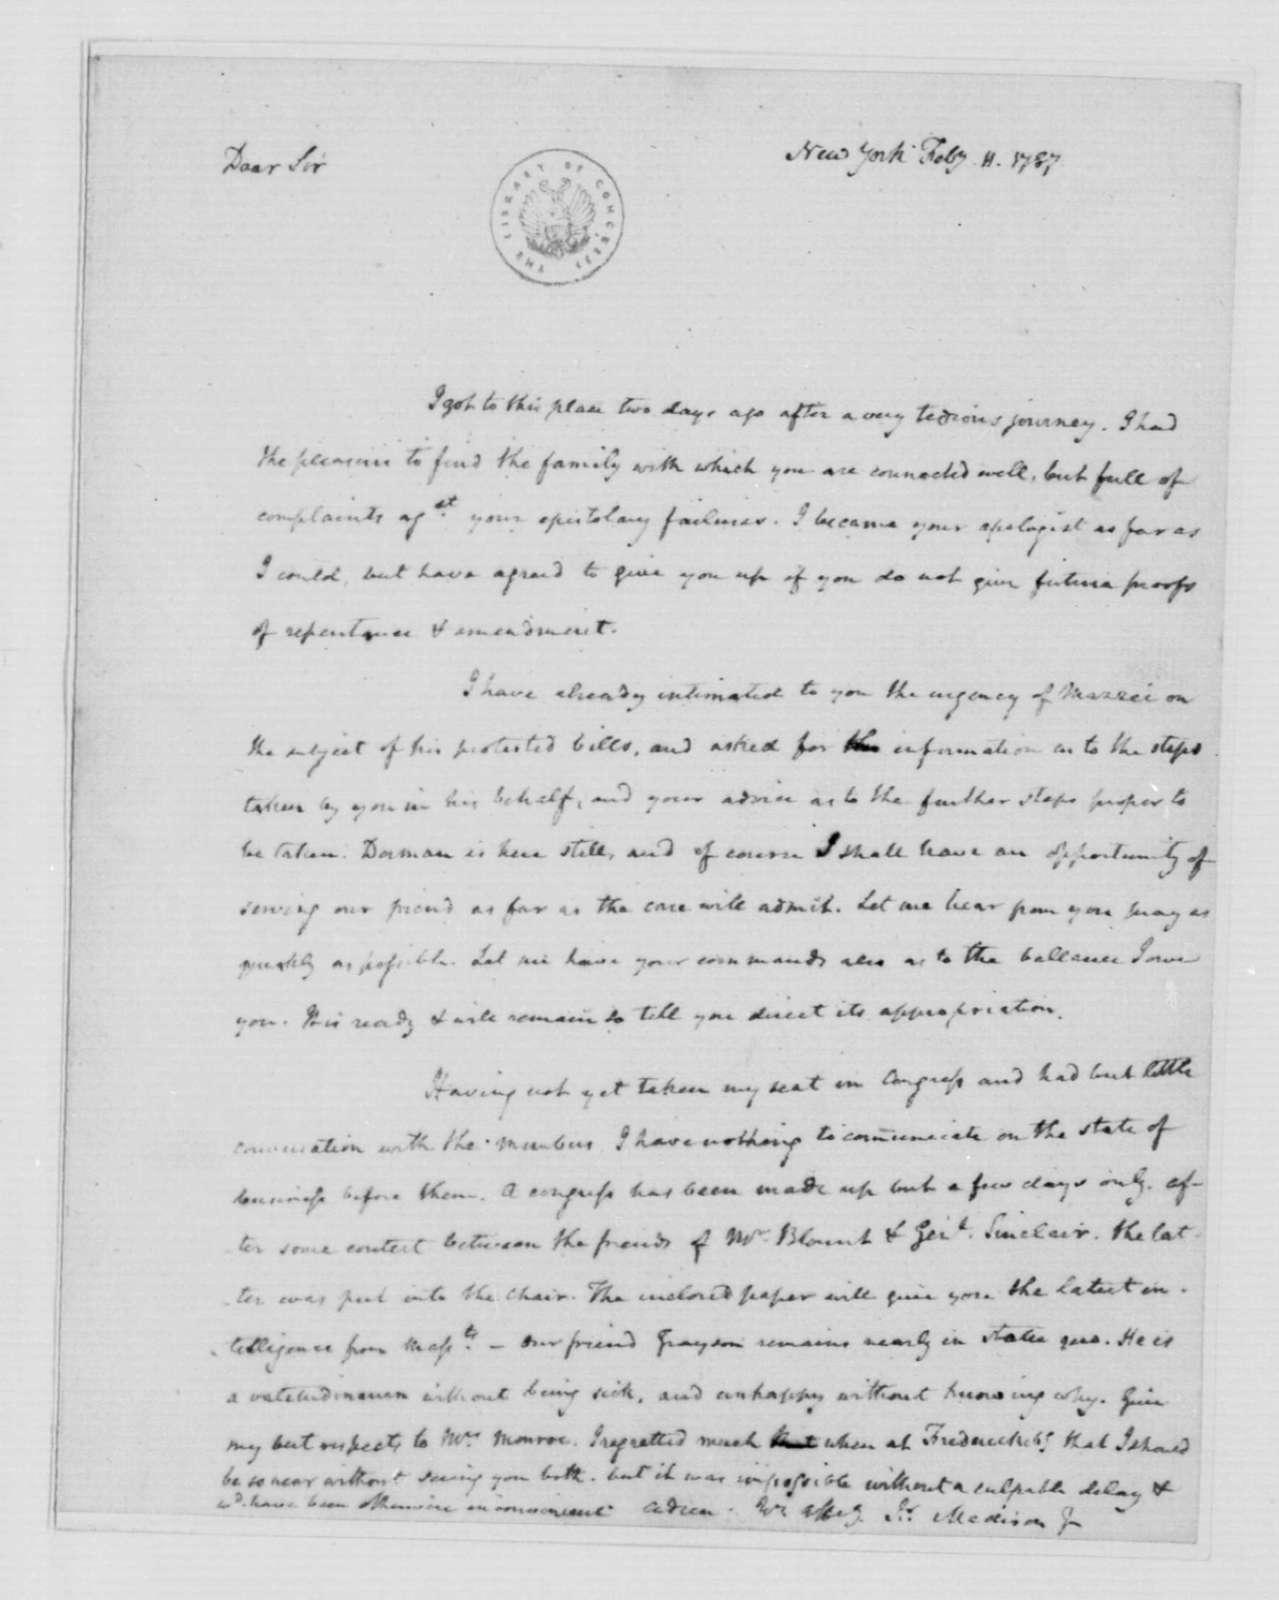 James Madison to James Monroe, February 11, 1787.